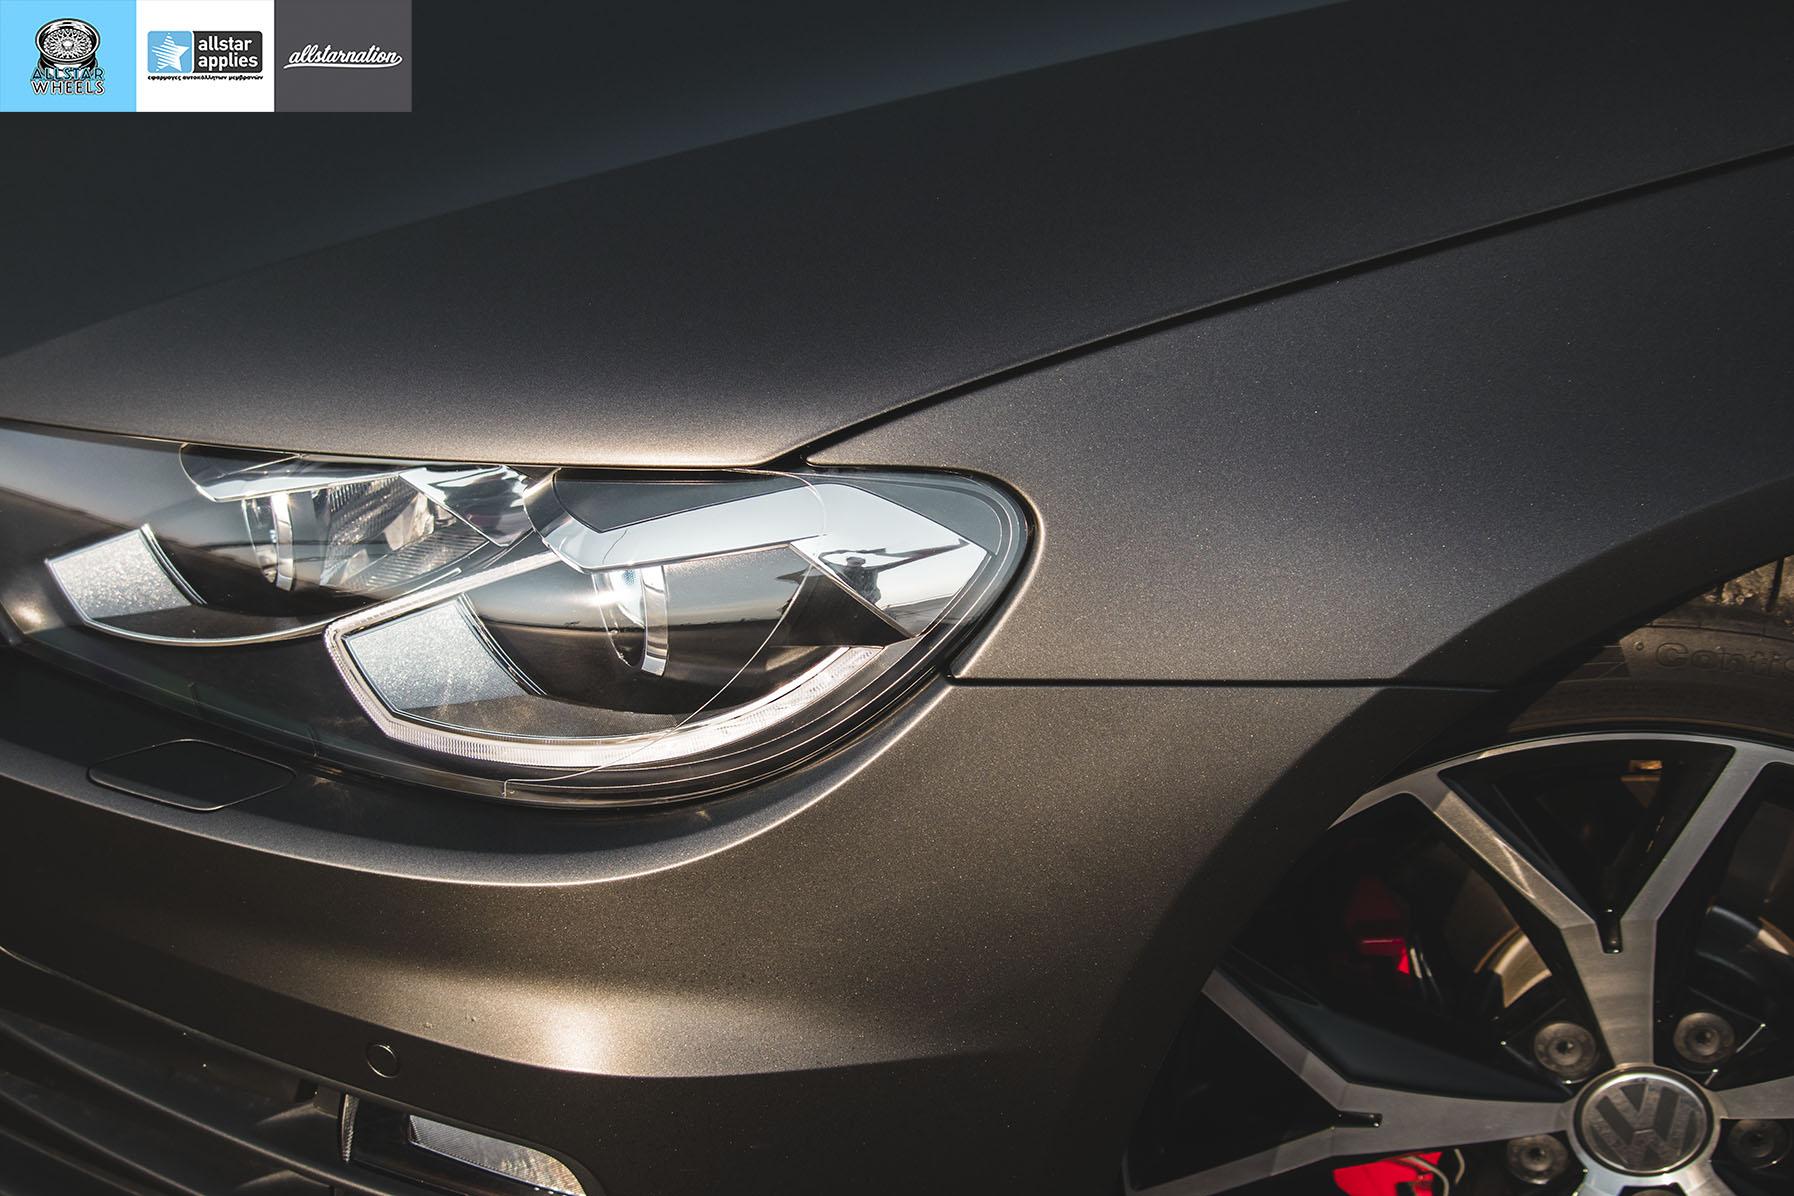 VW SCIROCCO MATT DIAMOND BLACK ALLSTAR APPLIES (25)